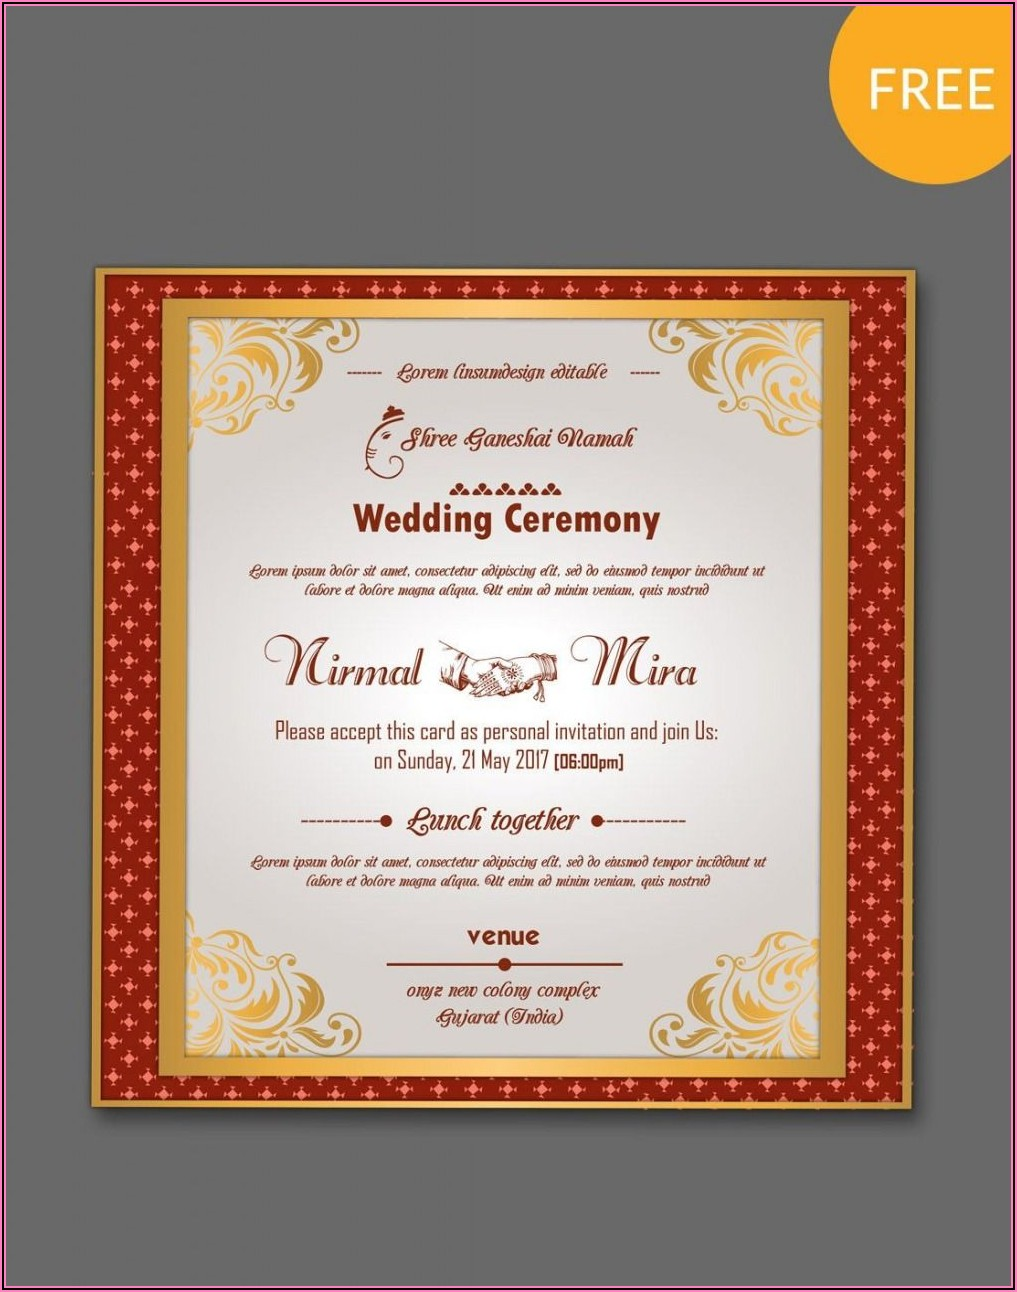 Hindu Wedding Invitation Cards Templates Free Download